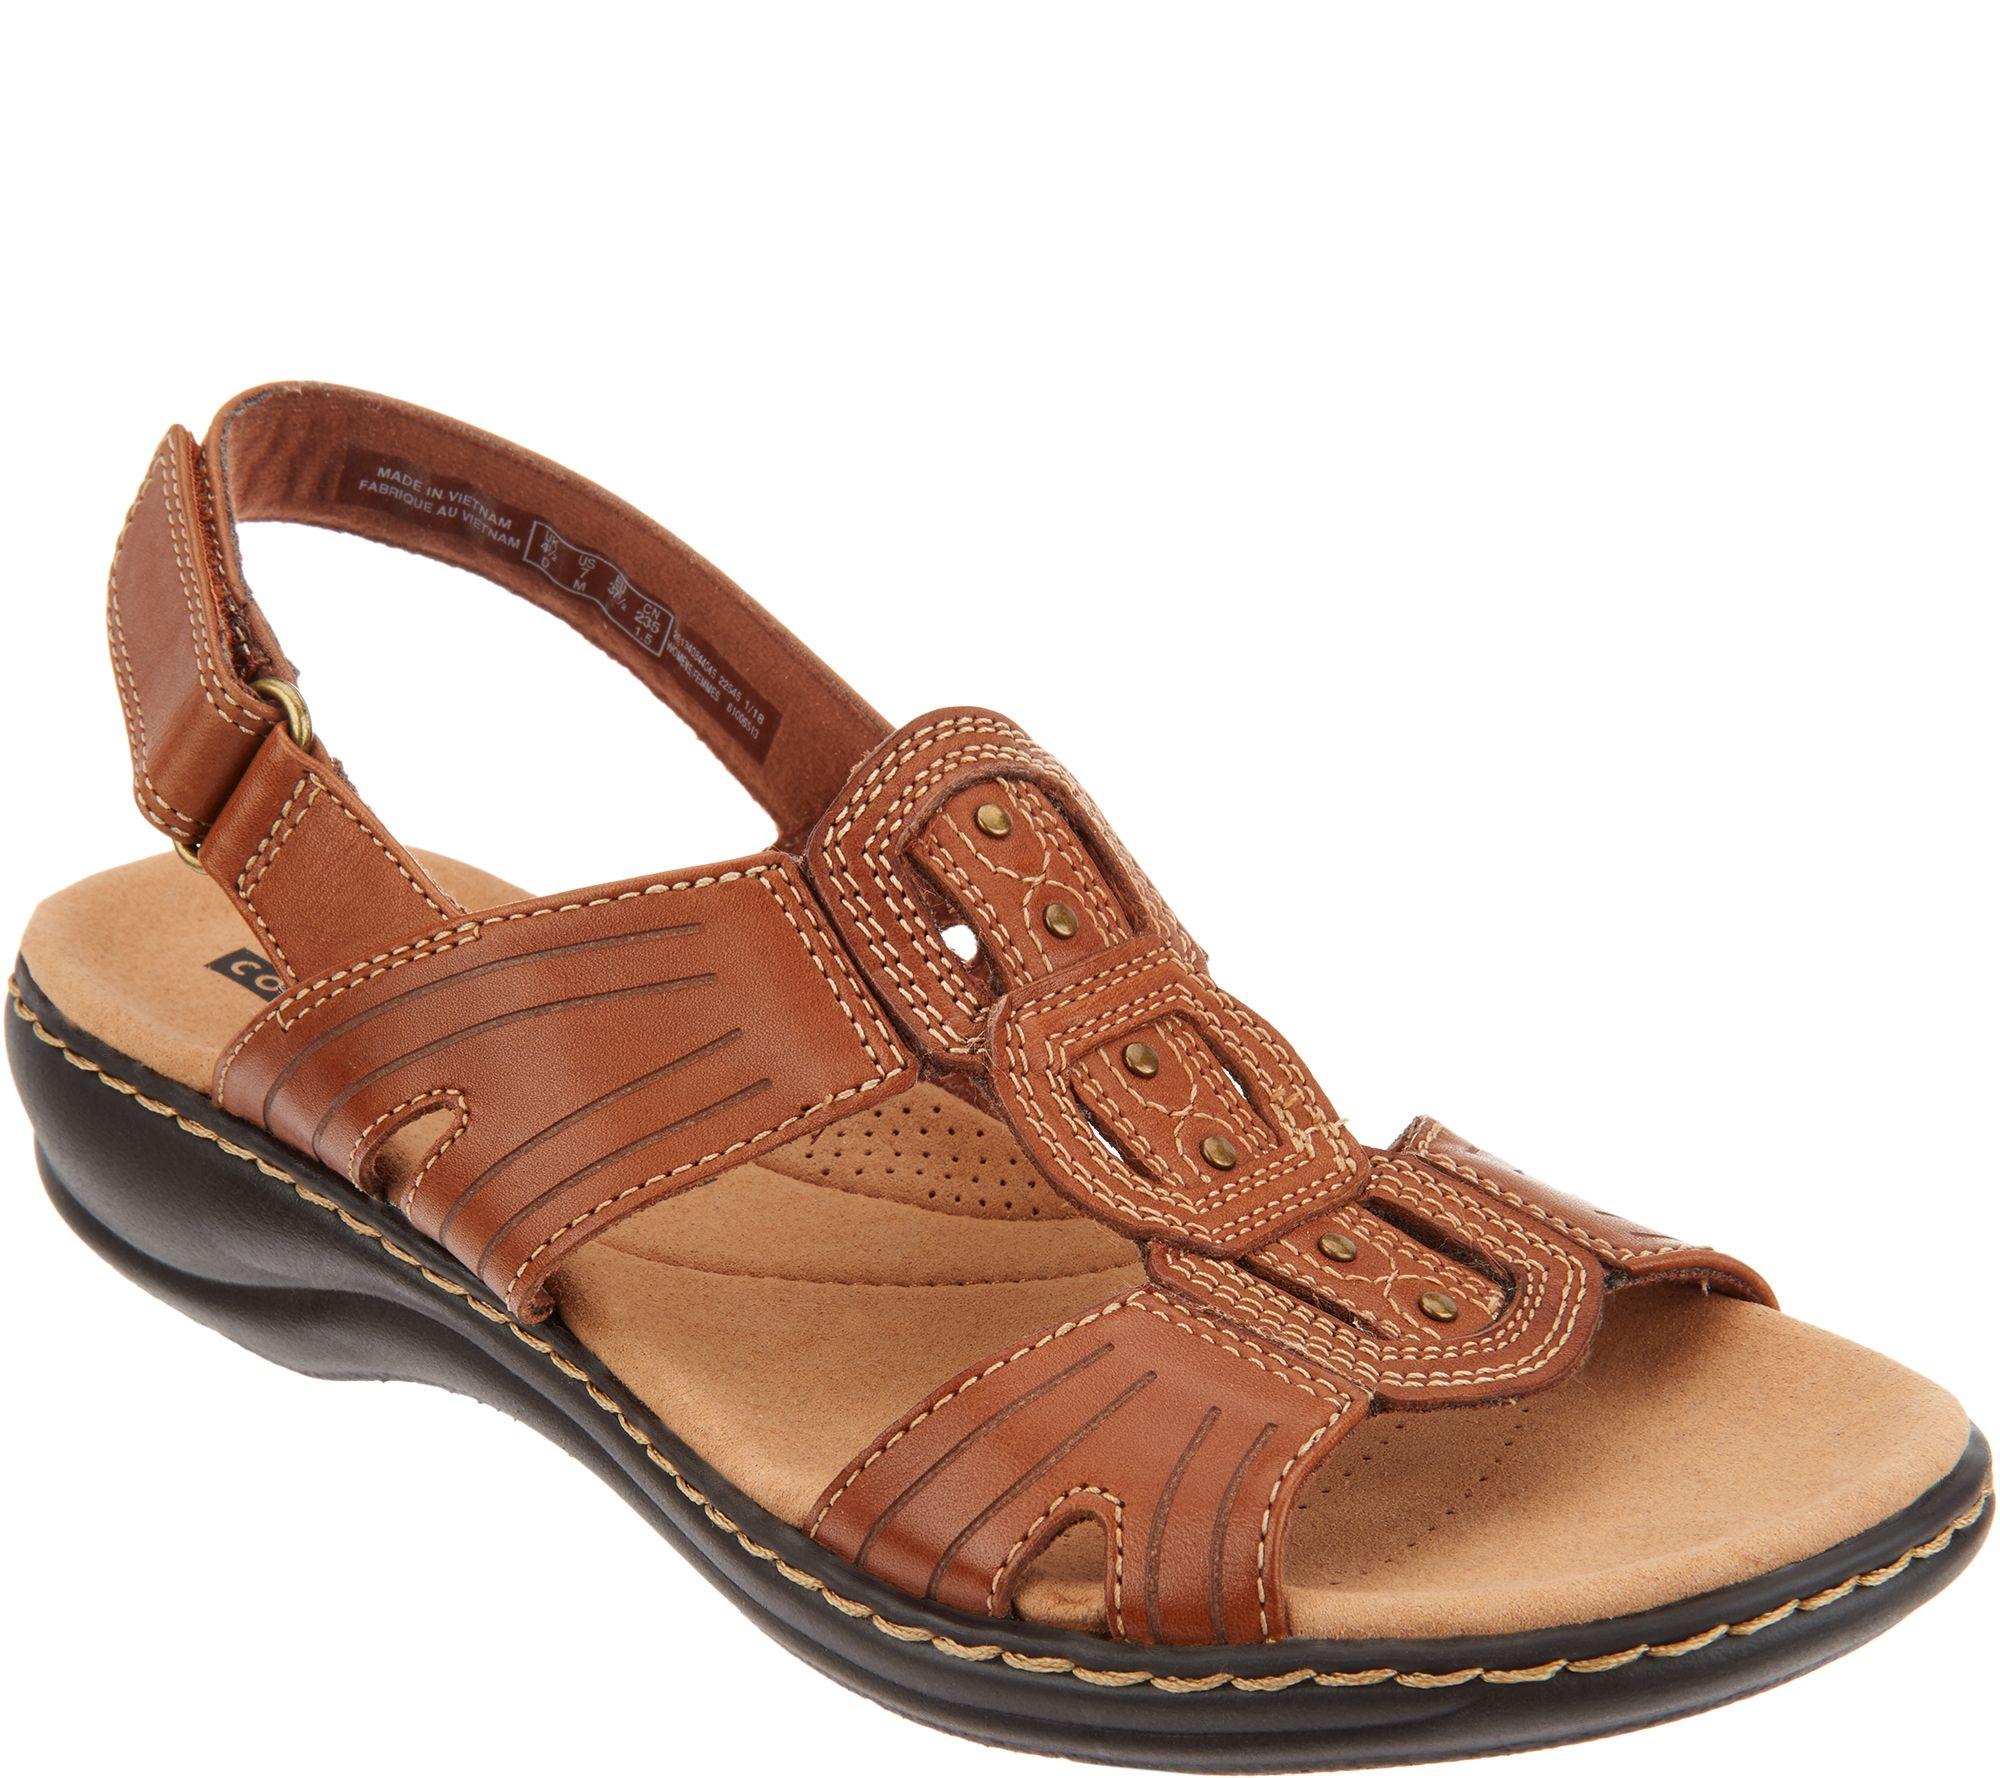 9d646b66237 Clarks Leather Lightweight Adjustable Sandals - Leisa Vine - Page 1 —  QVC.com